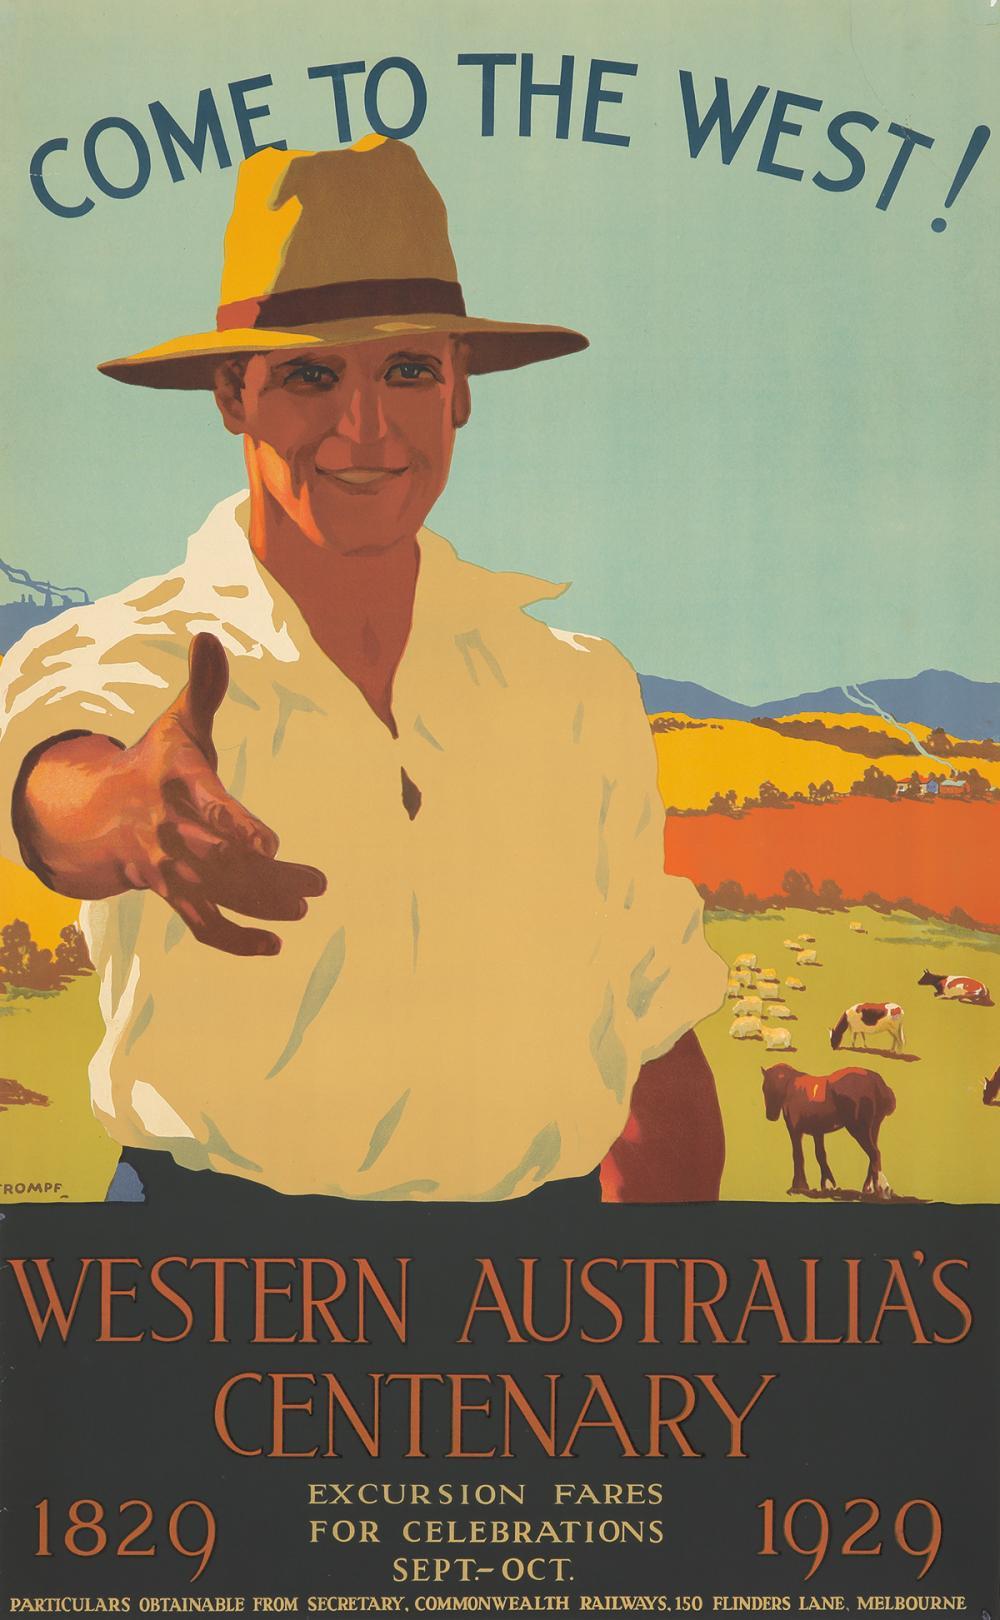 Western Australia's Centenary. ca. 1929.